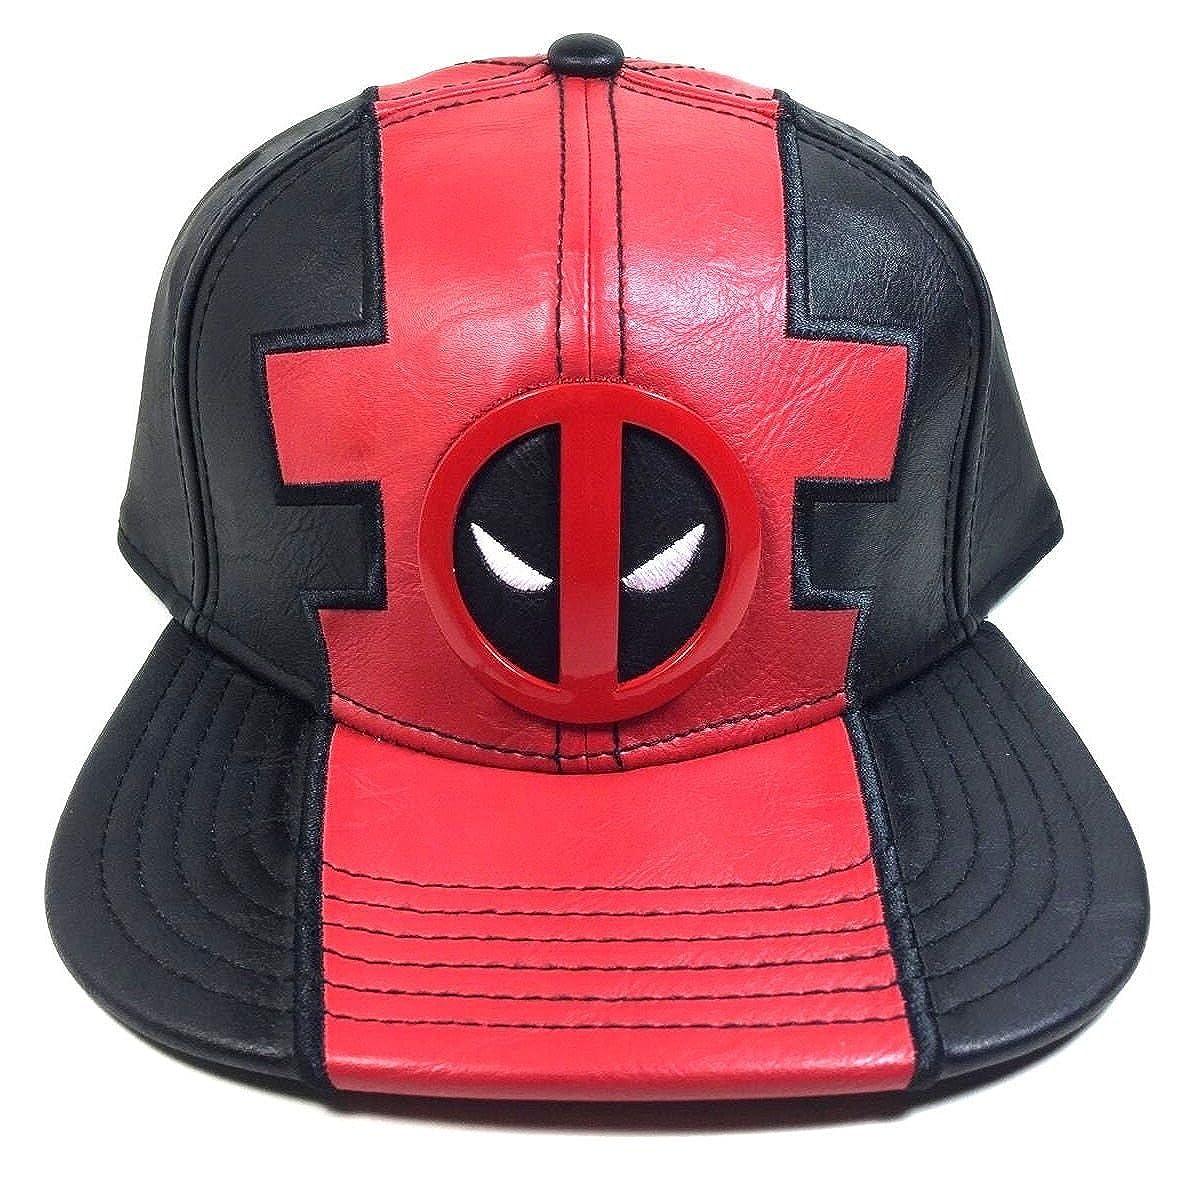 save off 89c41 cce62 Amazon.com  Marvel Comics Deadpool Suit Up Pu Faux Leather Snapback   Clothing